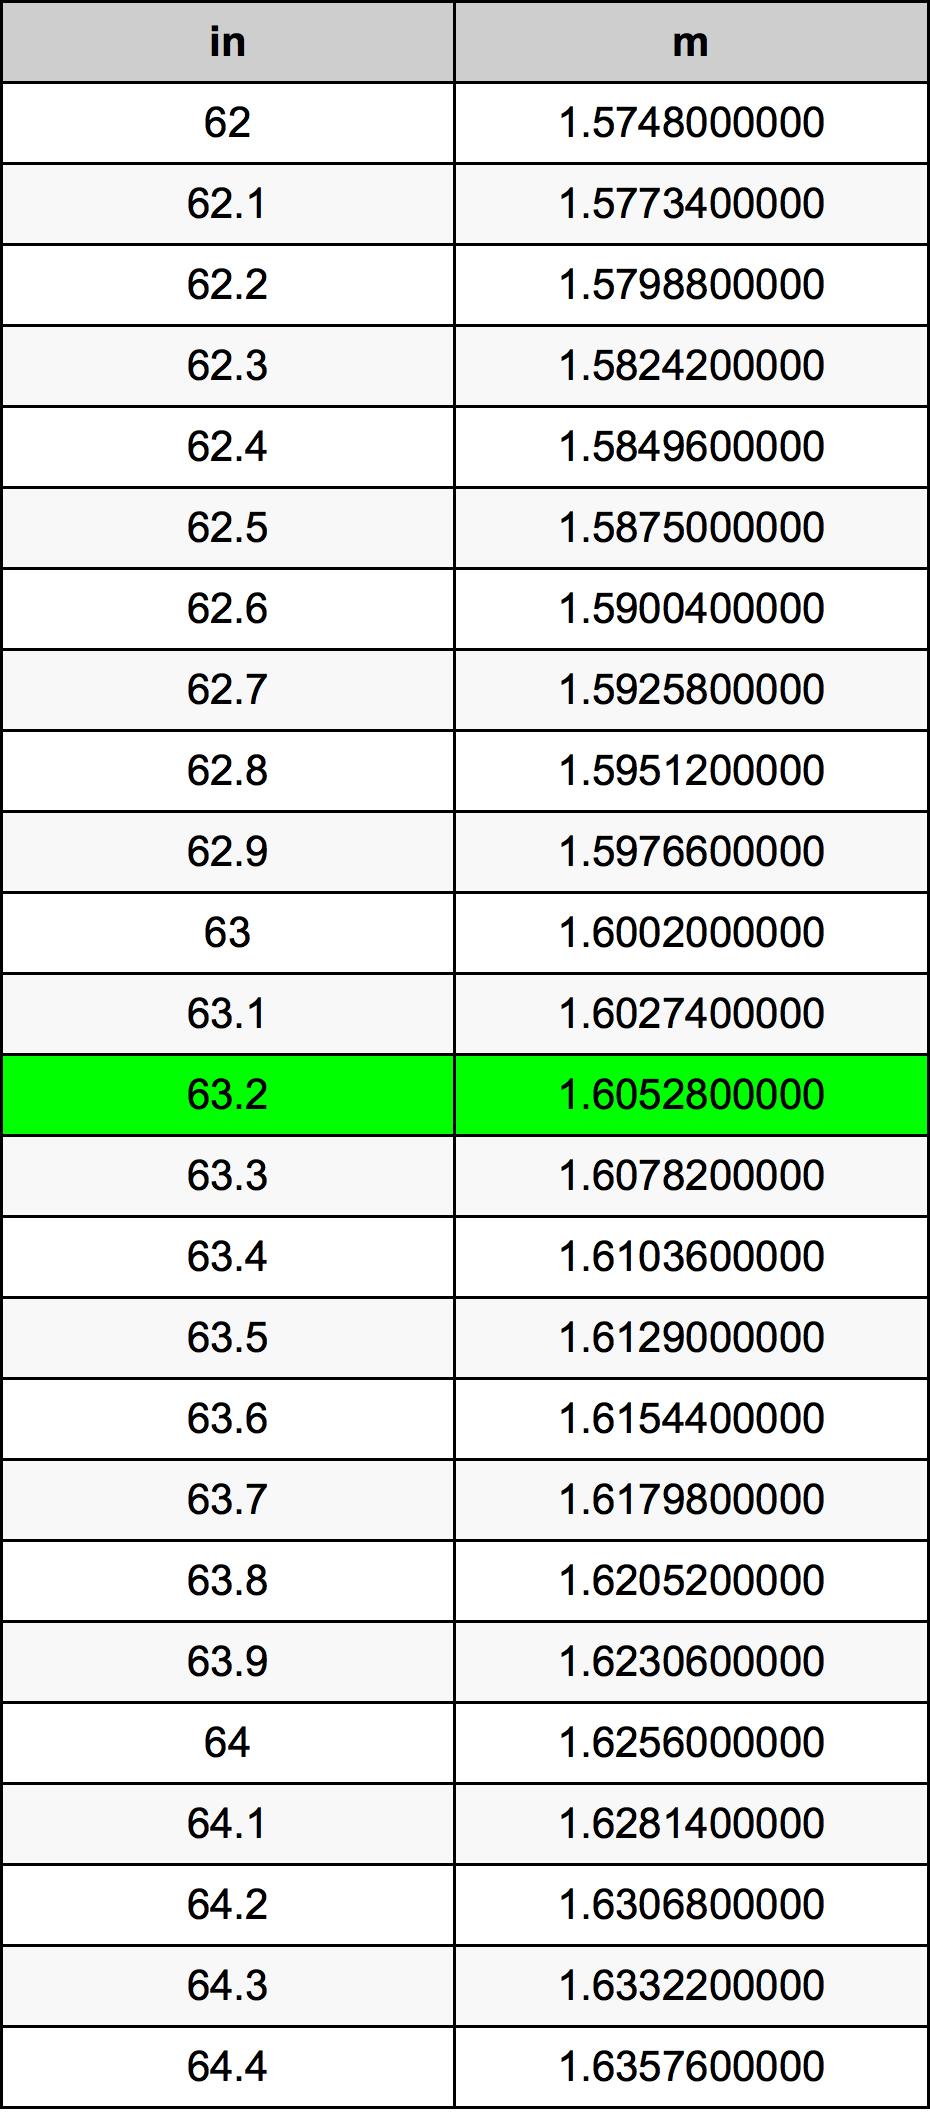 63.2 Inch konverteringstabell